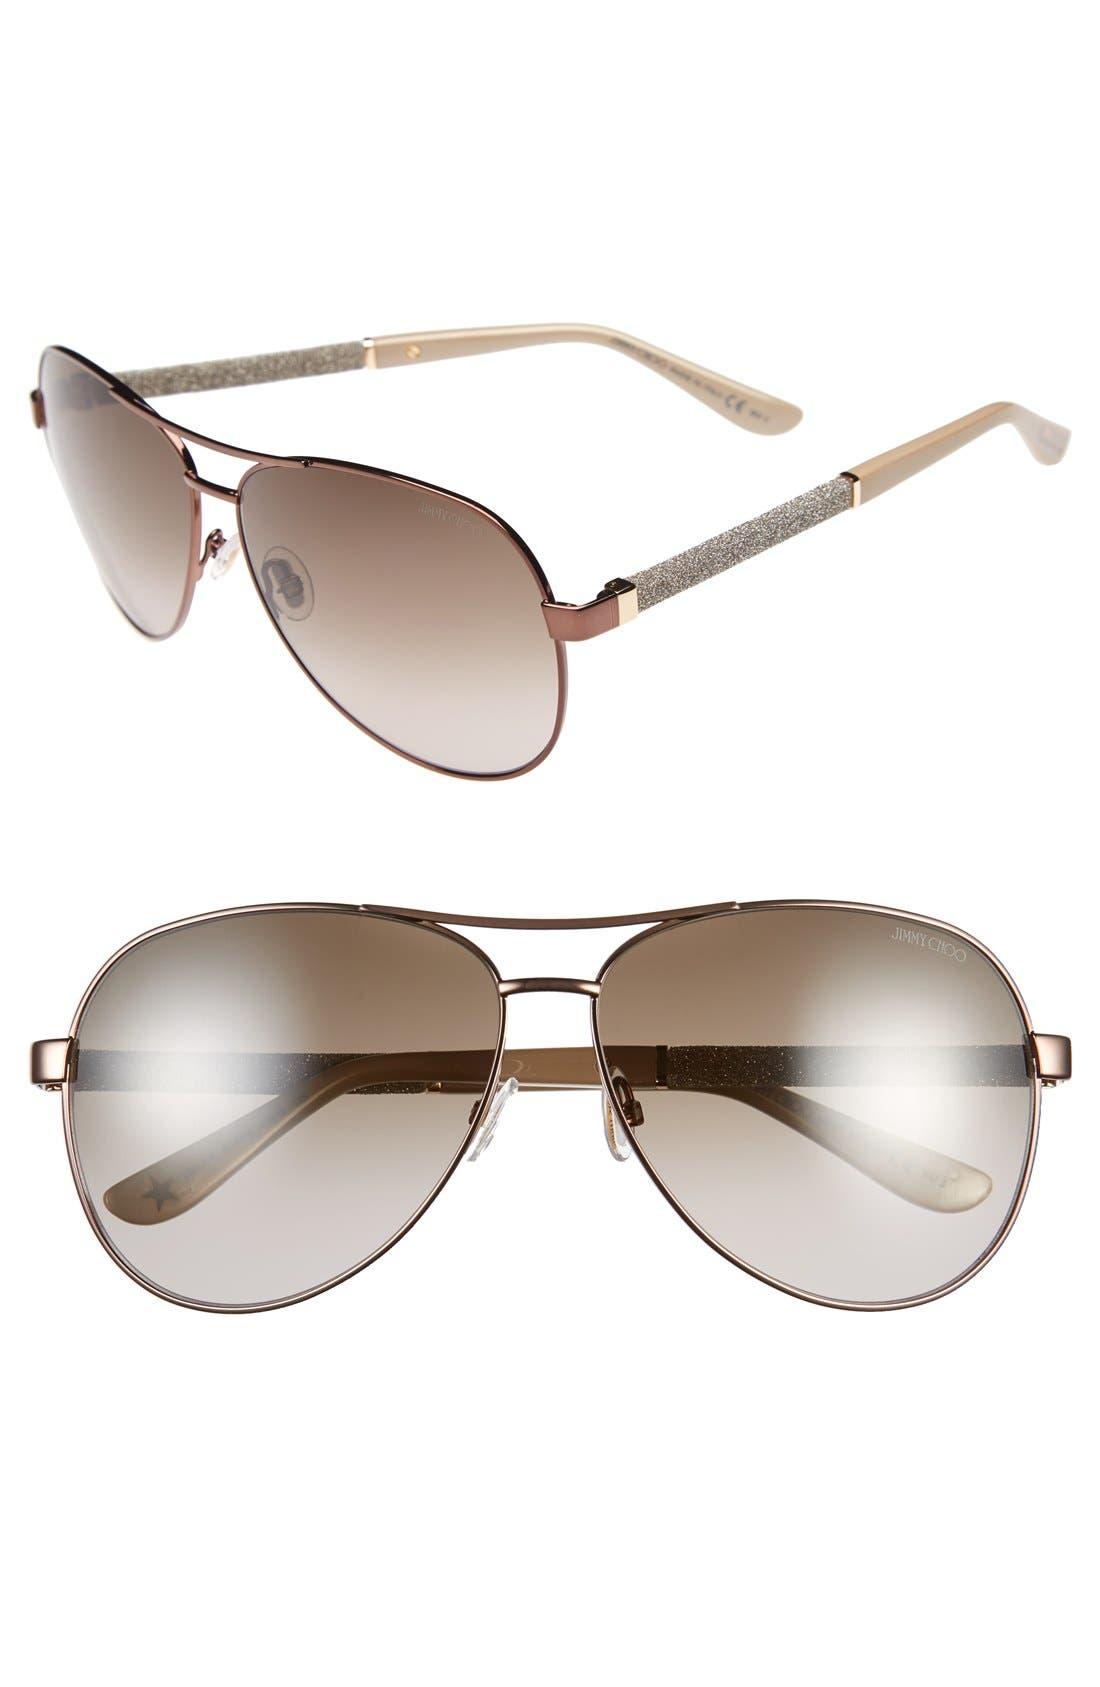 Alternate Image 1 Selected - Jimmy Choo 61mm Aviator Sunglasses